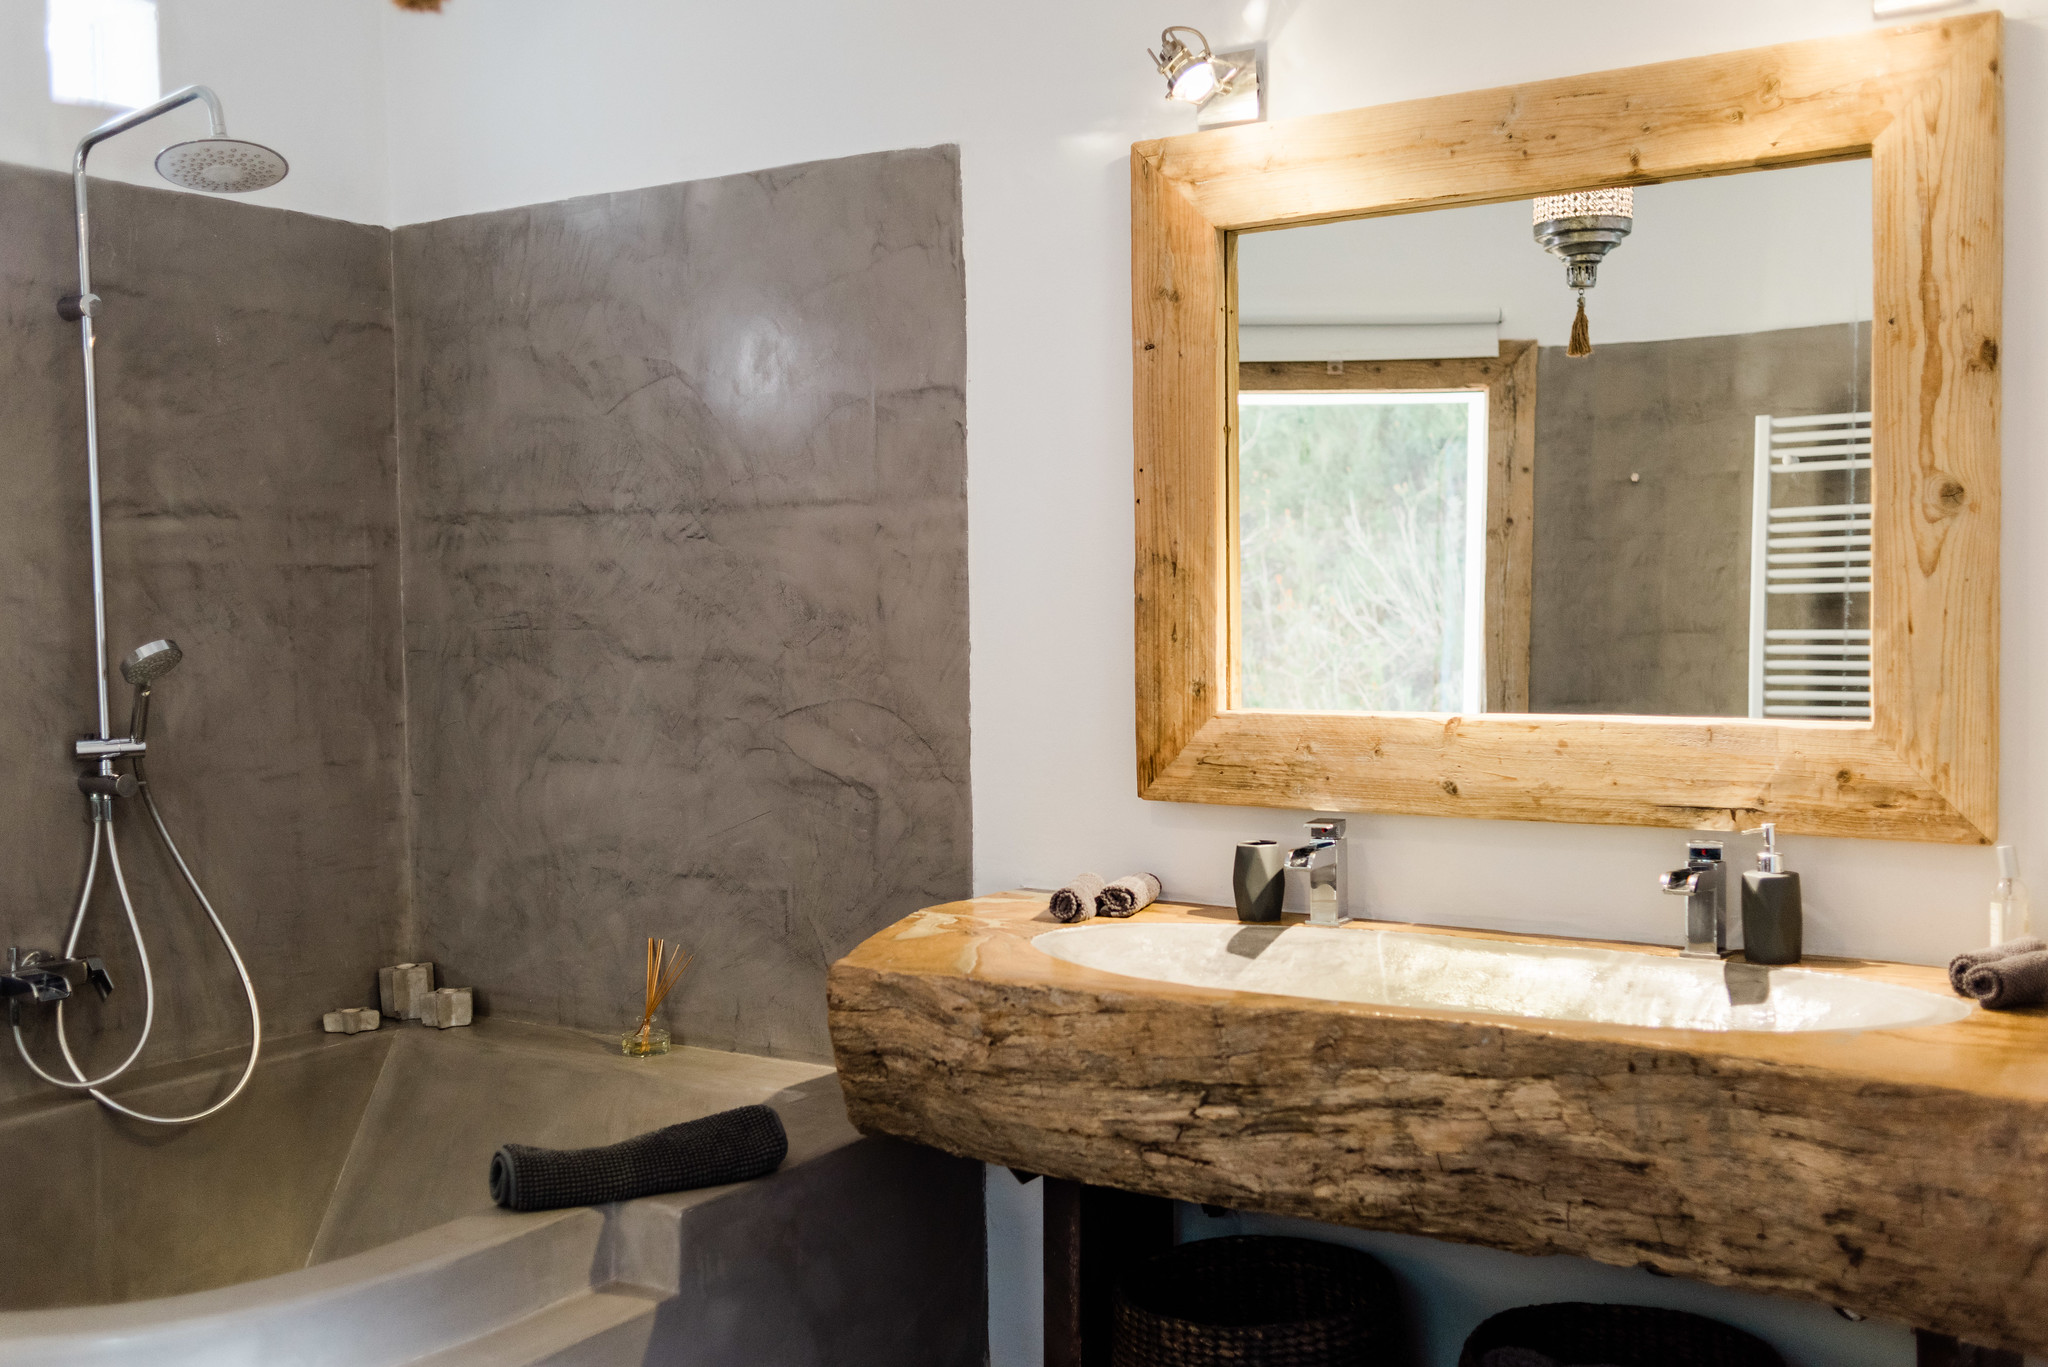 https://www.white-ibiza.com/wp-content/uploads/2020/05/white-ibiza-villas-can-verde-interior-bathroom.jpg